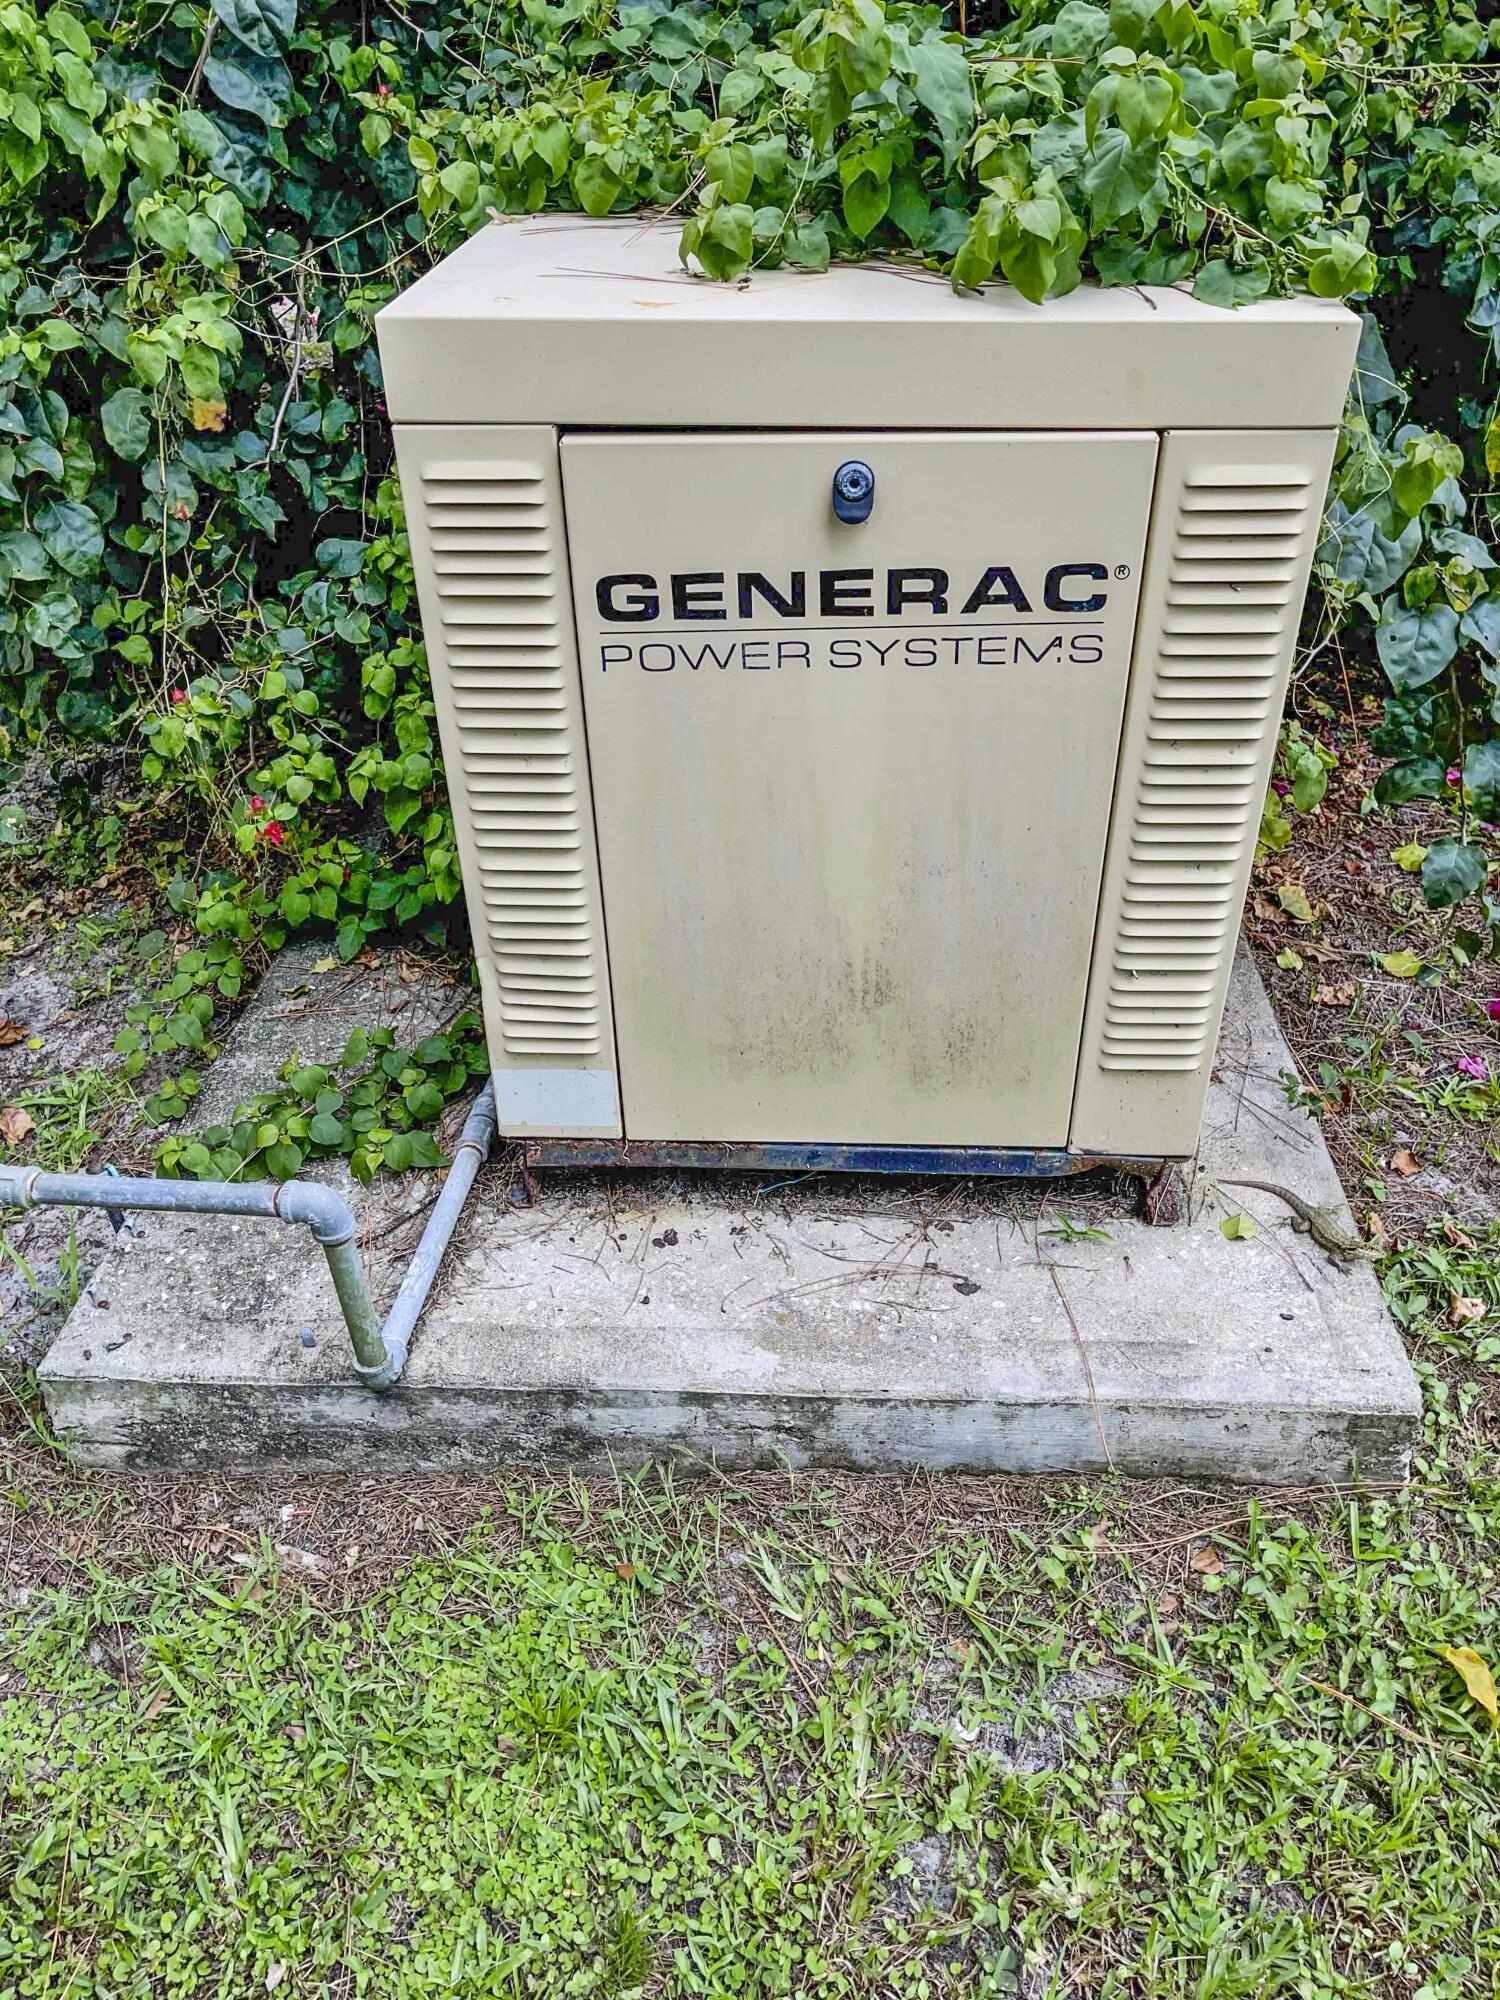 Guest House & Garage Generator